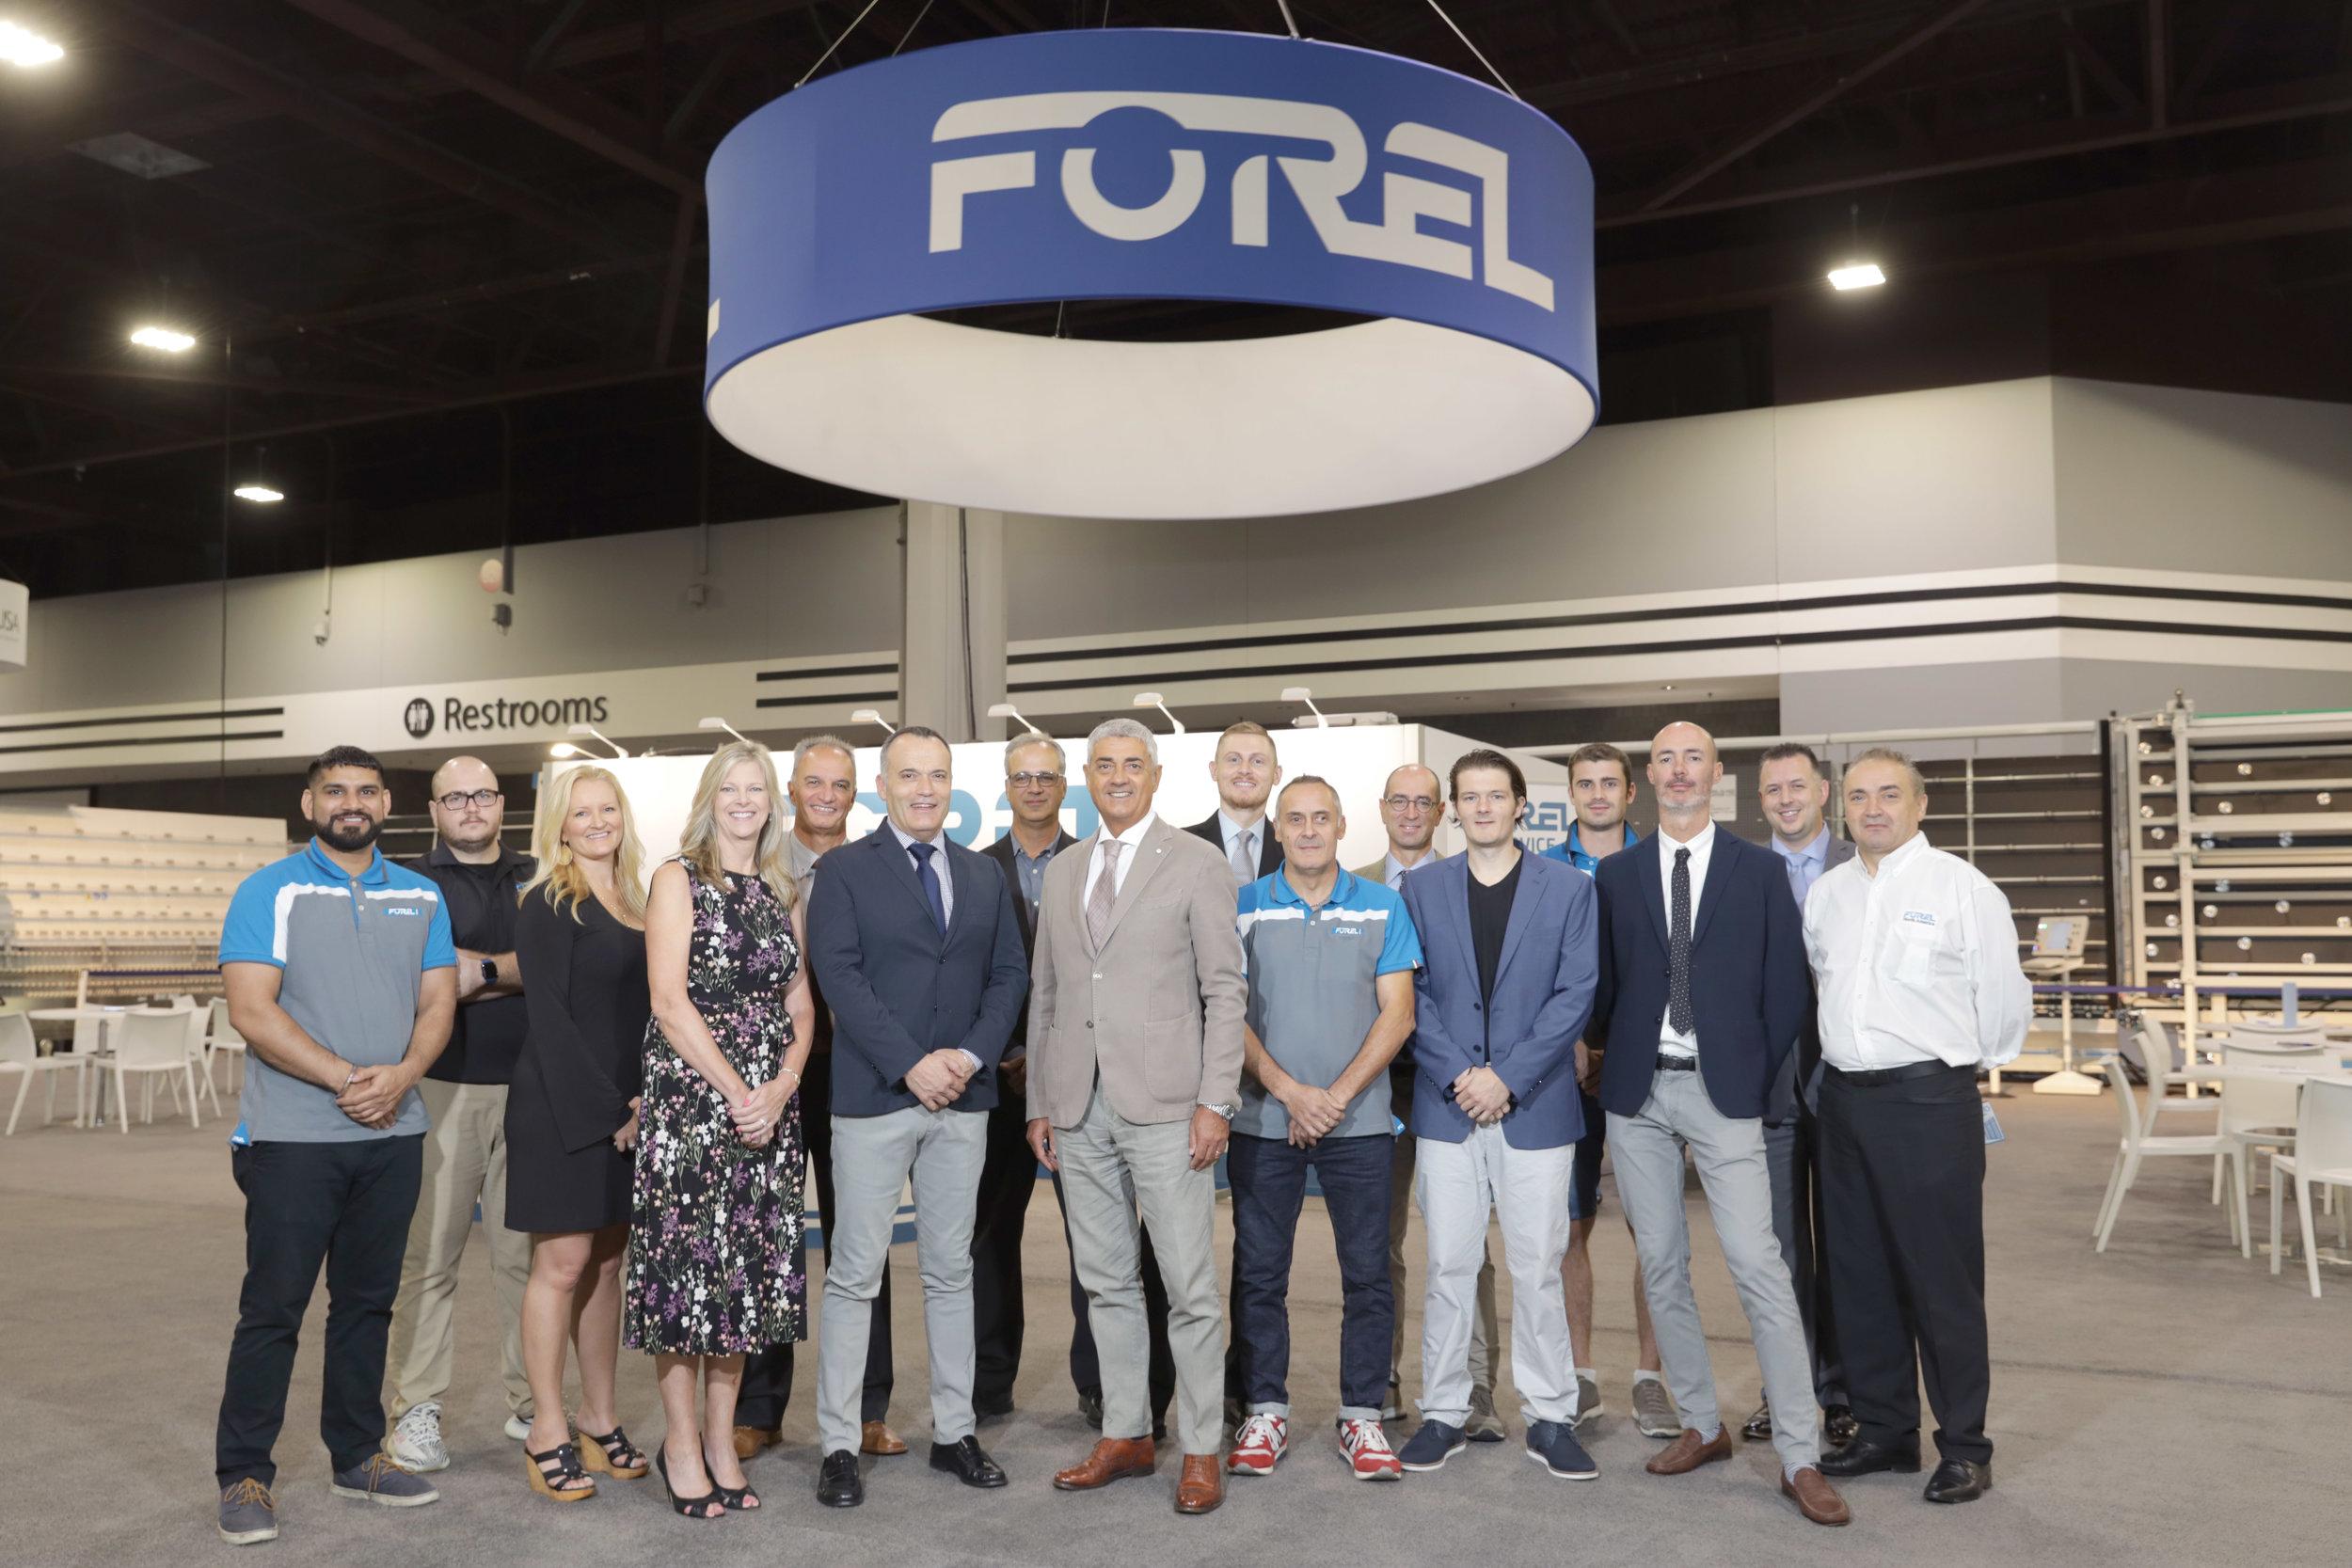 Forel Team at GBA 2019